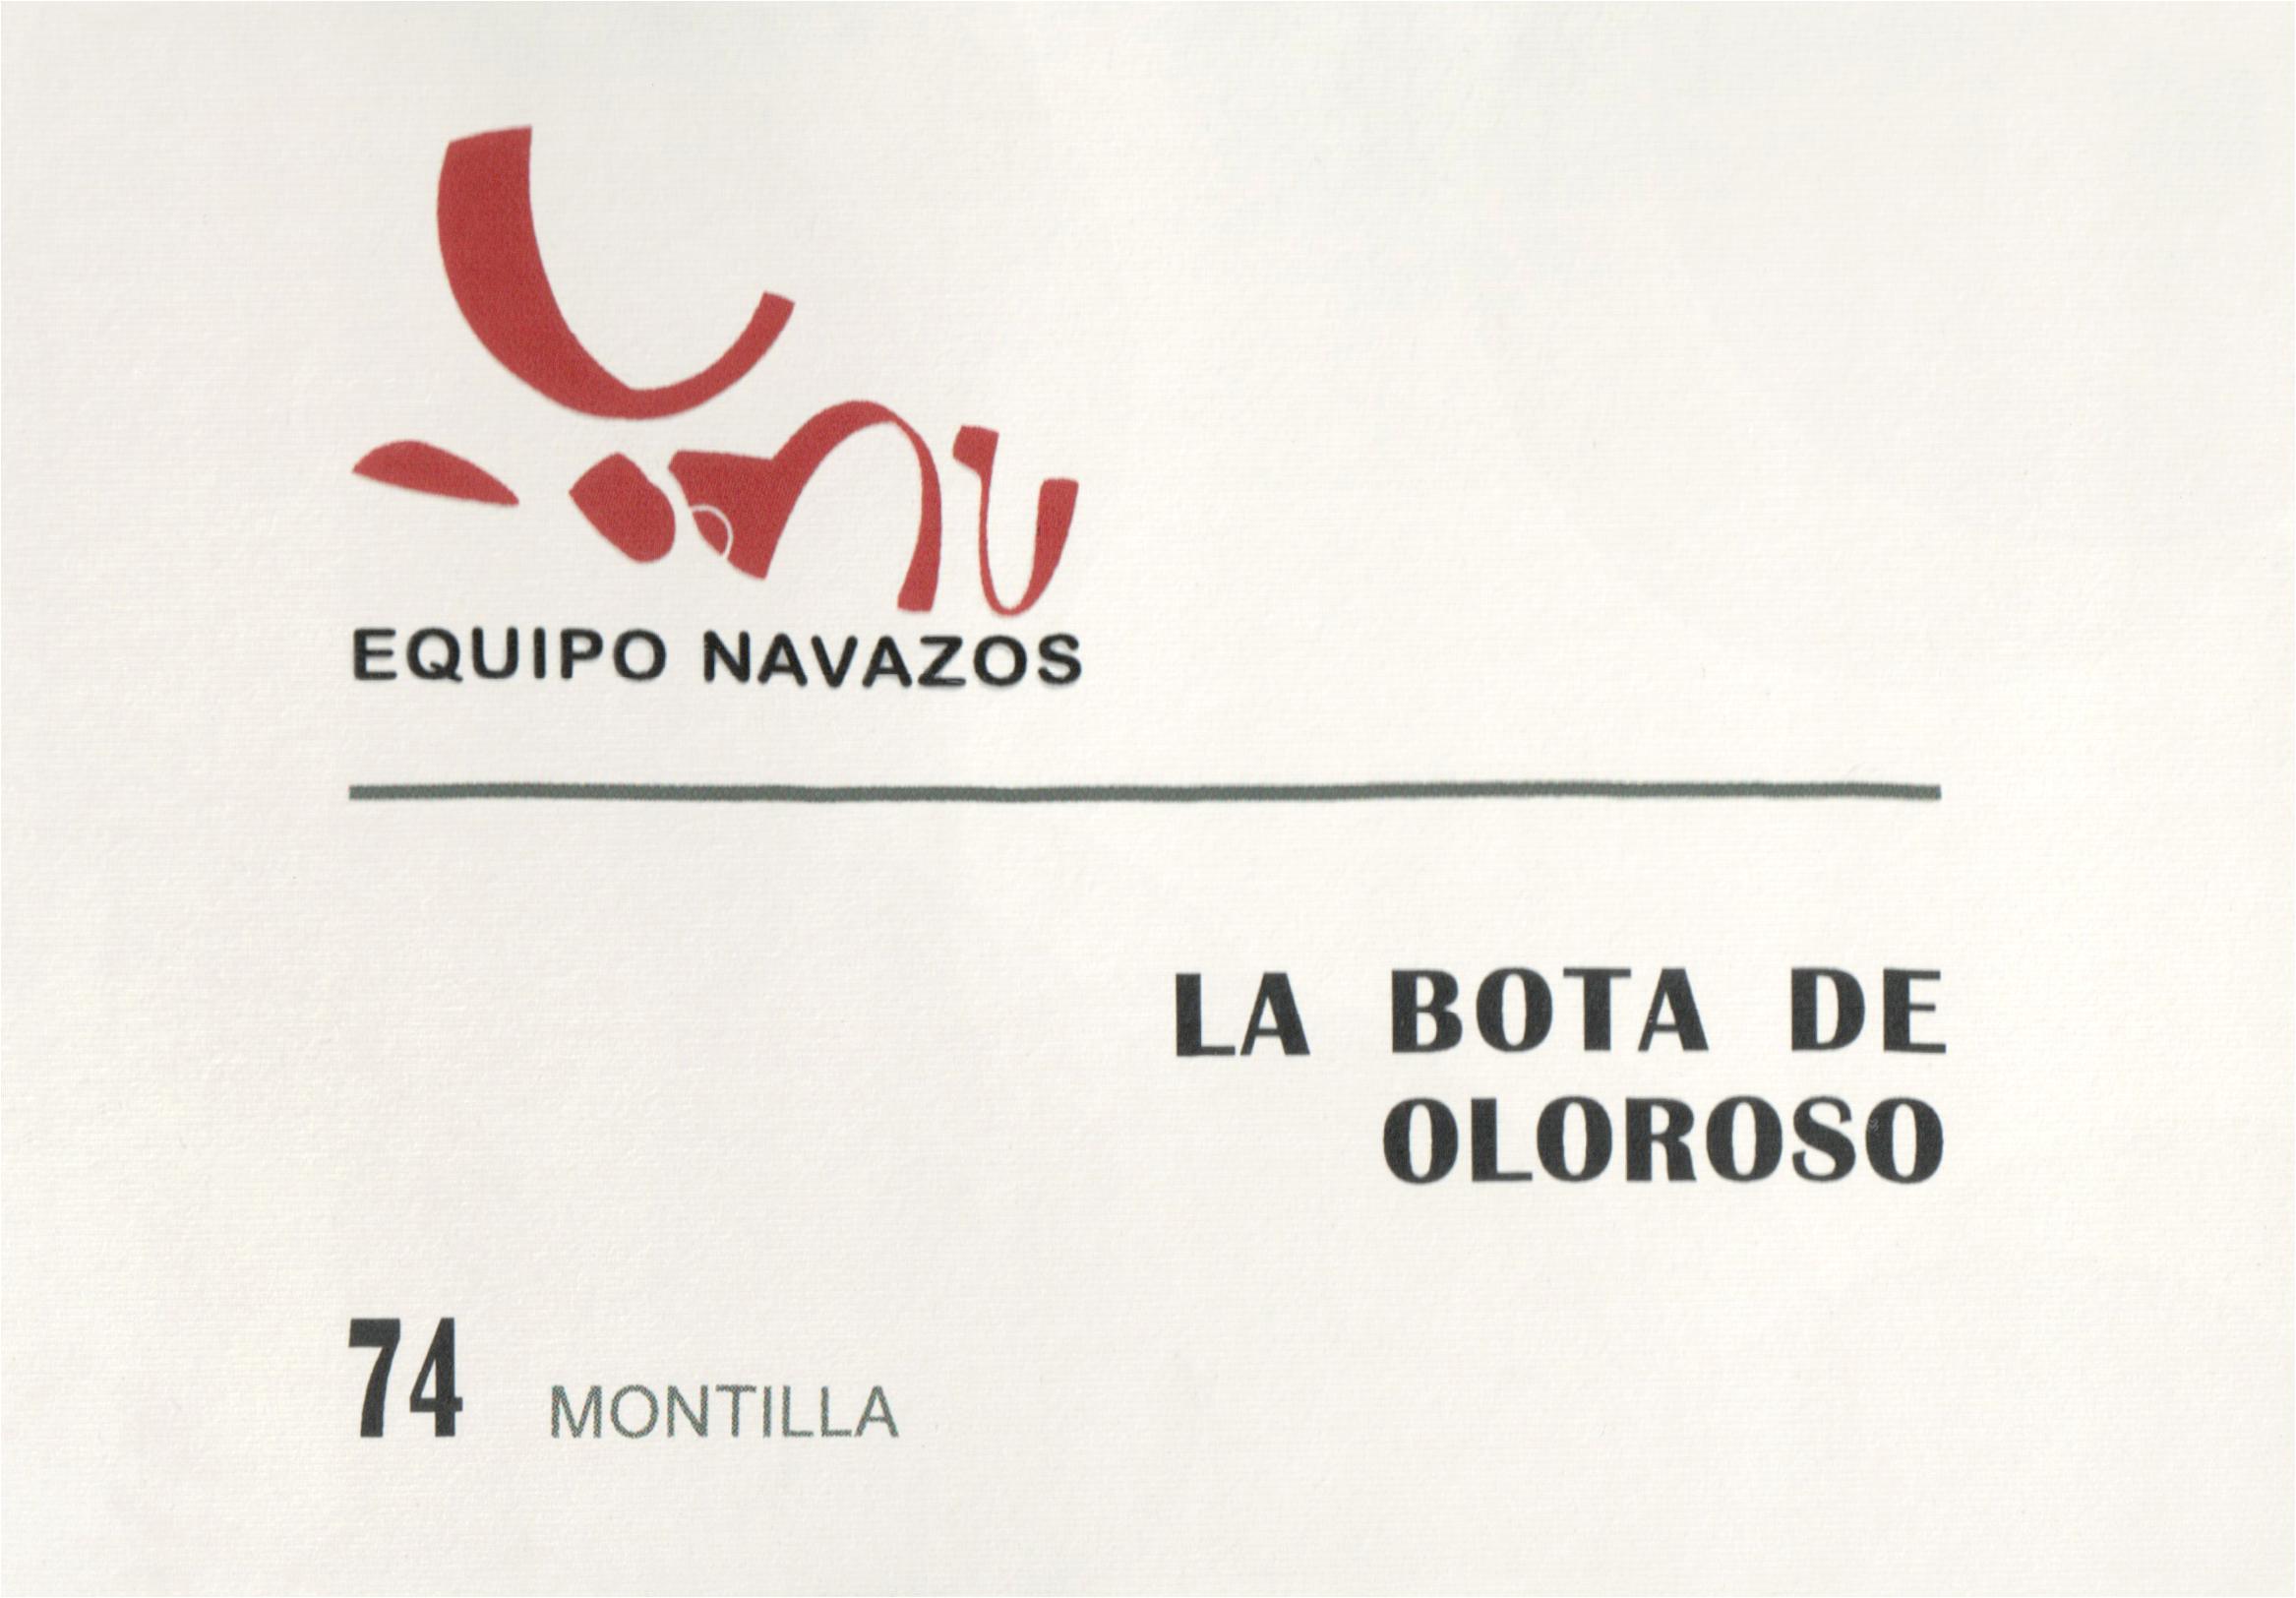 Equipo Navazos La Bota De Oloroso Montilla #74